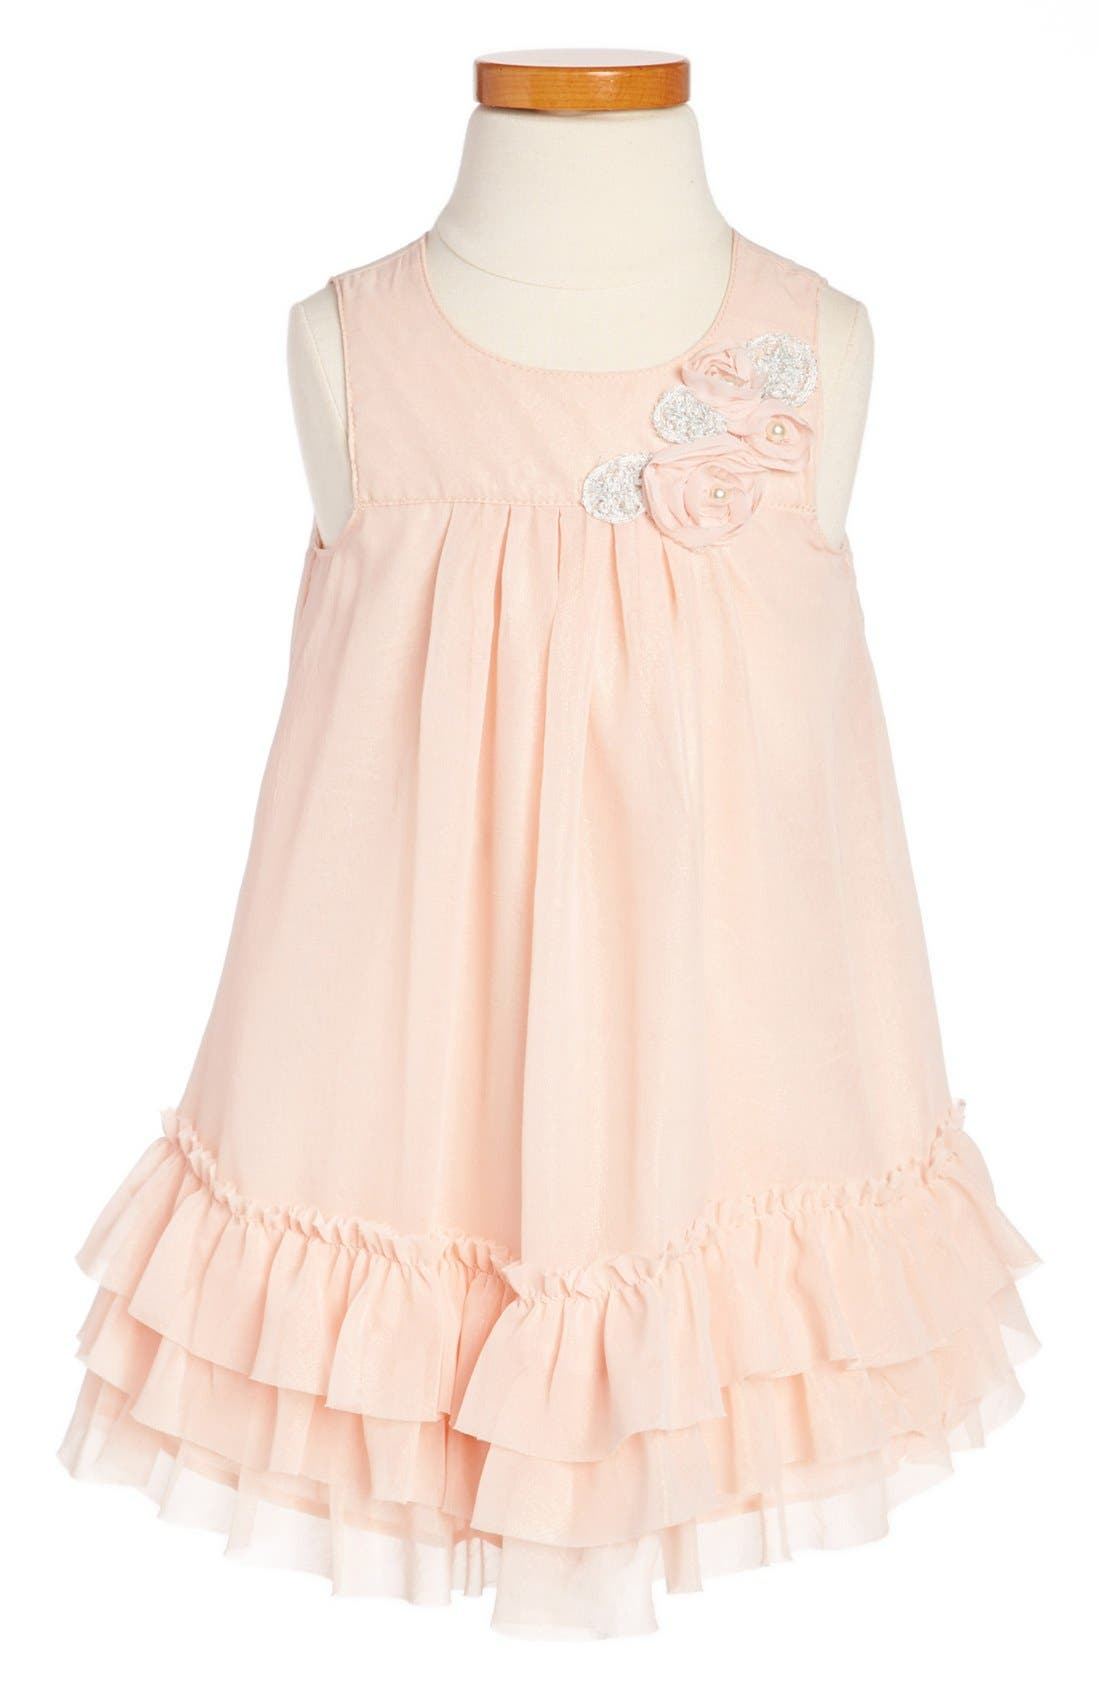 Main Image - Pippa & Julie Ruffle Dress (Toddler Girls)